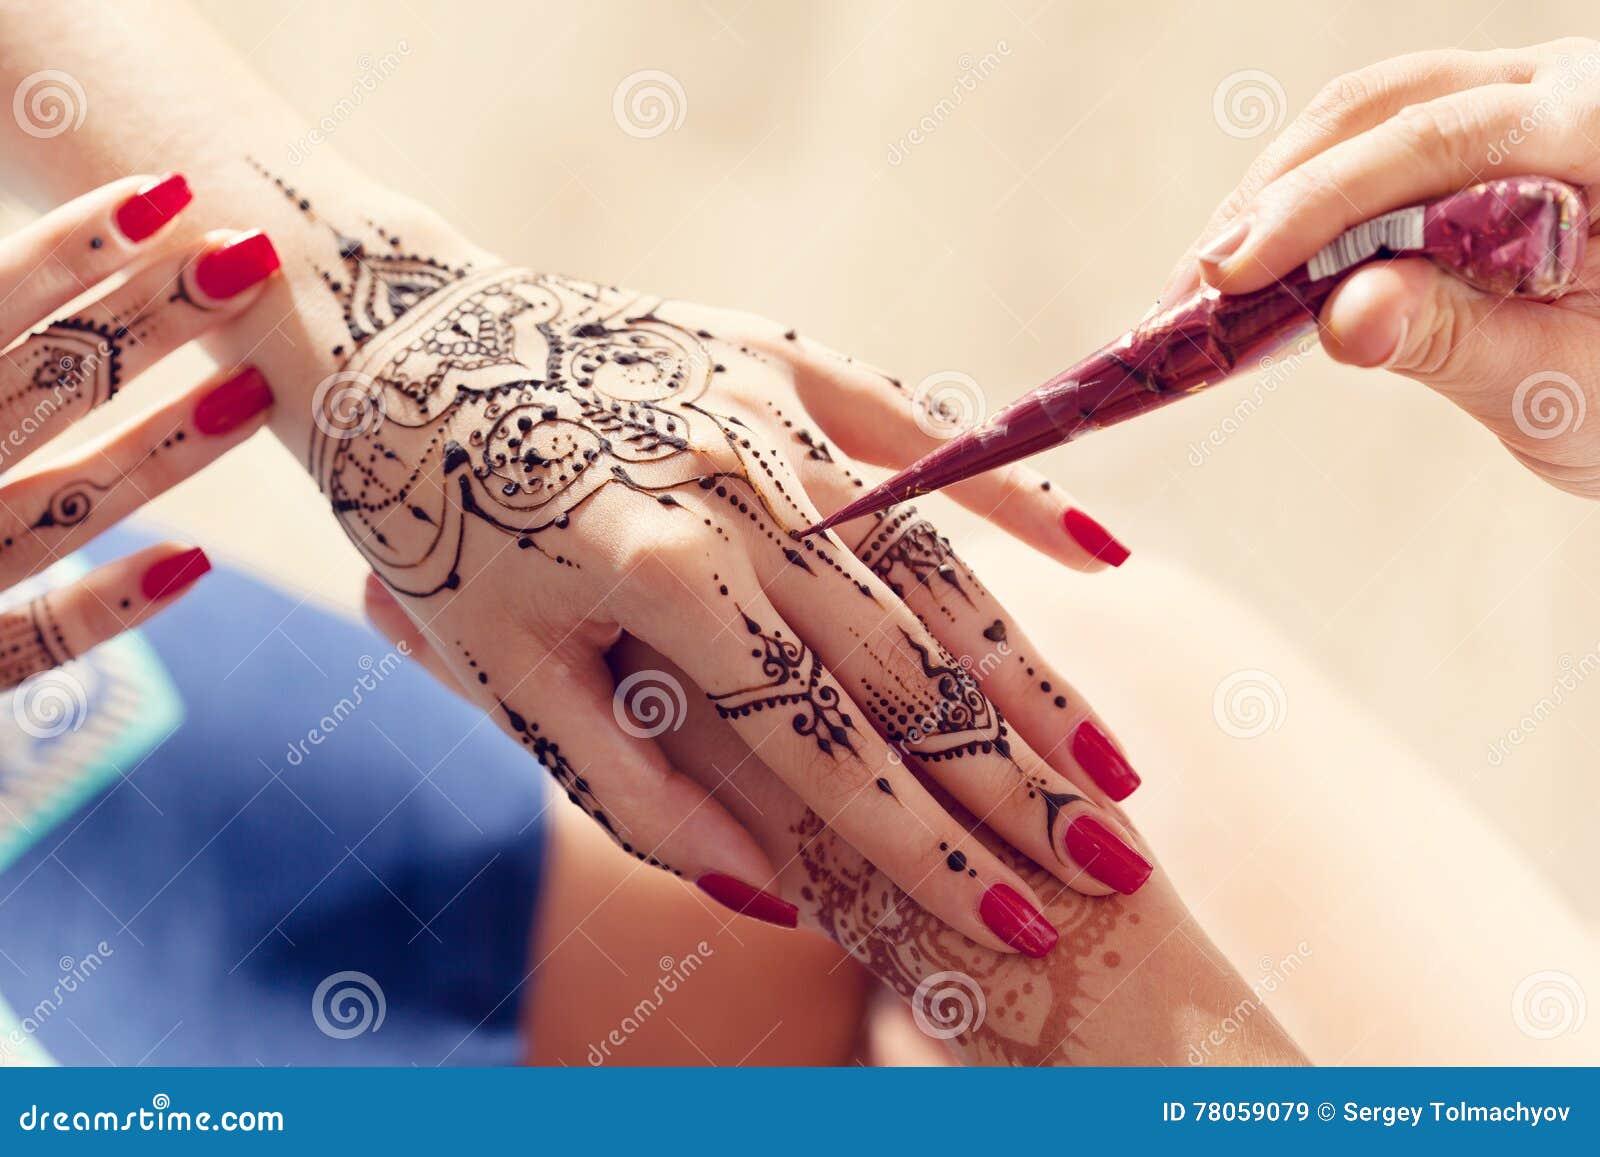 Mehndi Hands Powerpoint : Process of applying mehndi stock image luck